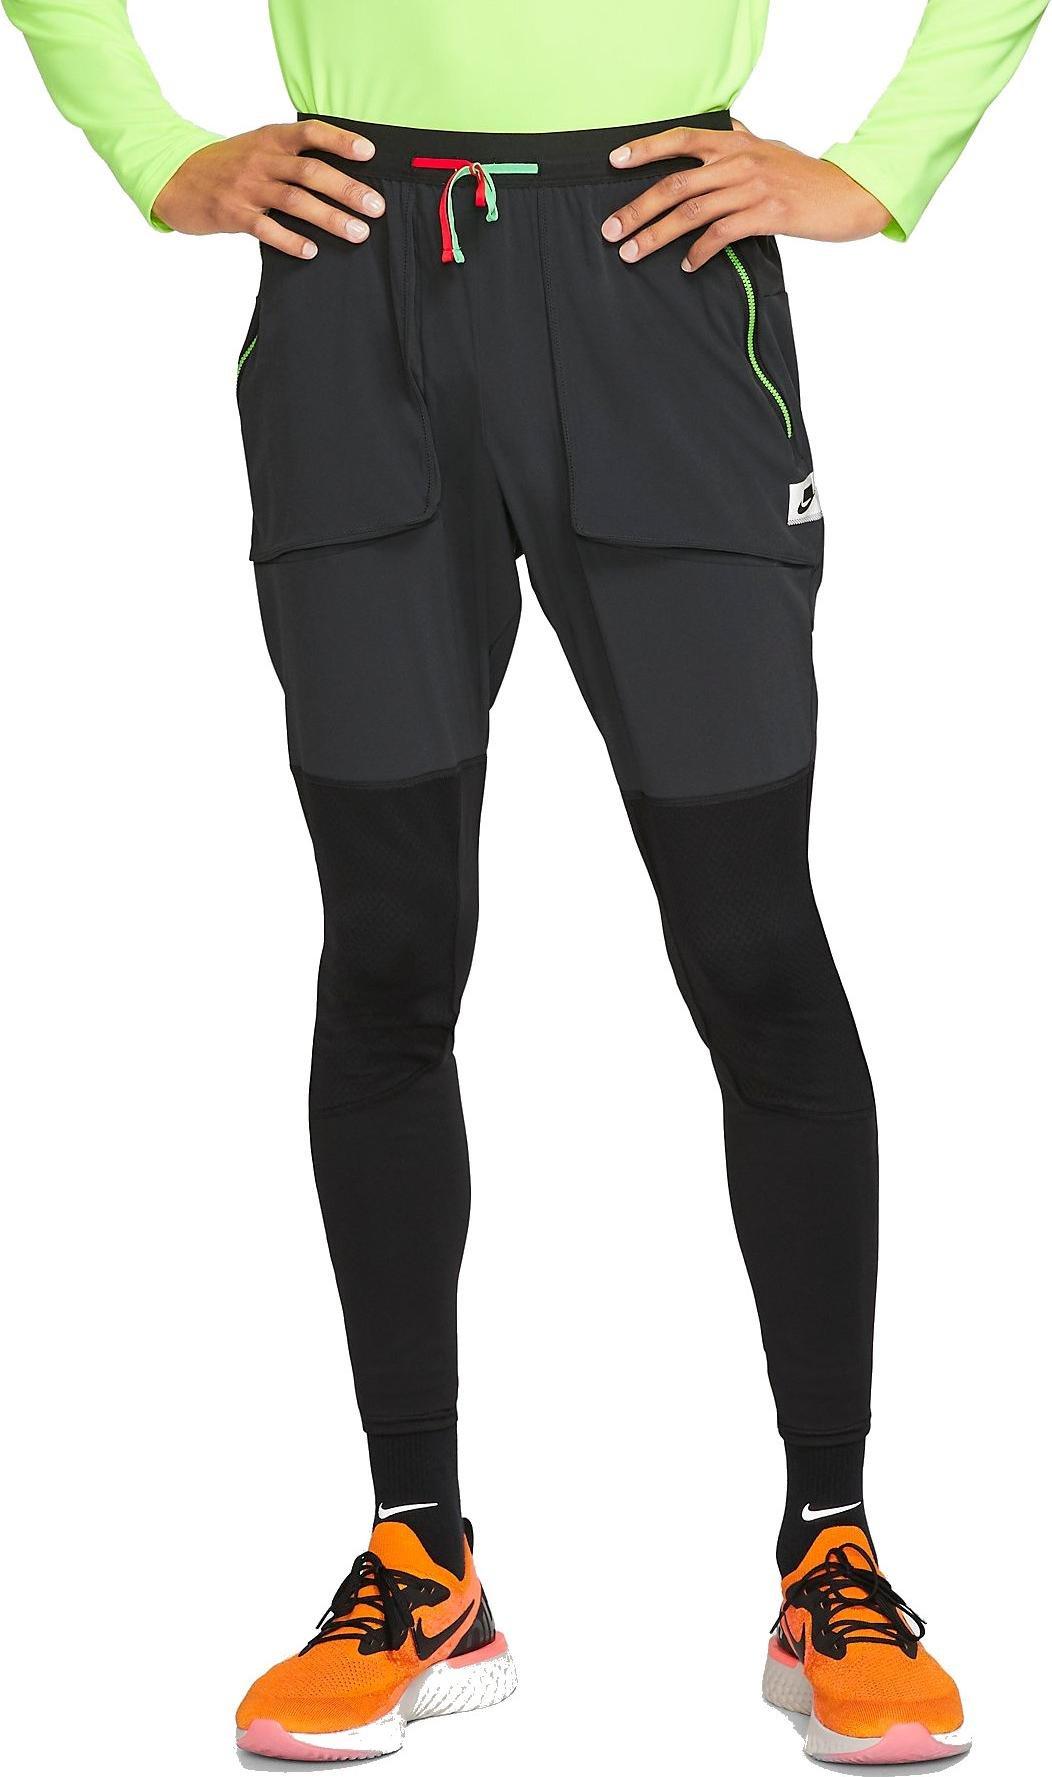 rasguño Persistente Deliberar  Pants Nike M NK WILD RUN HYBRID PANT - Top4Running.com